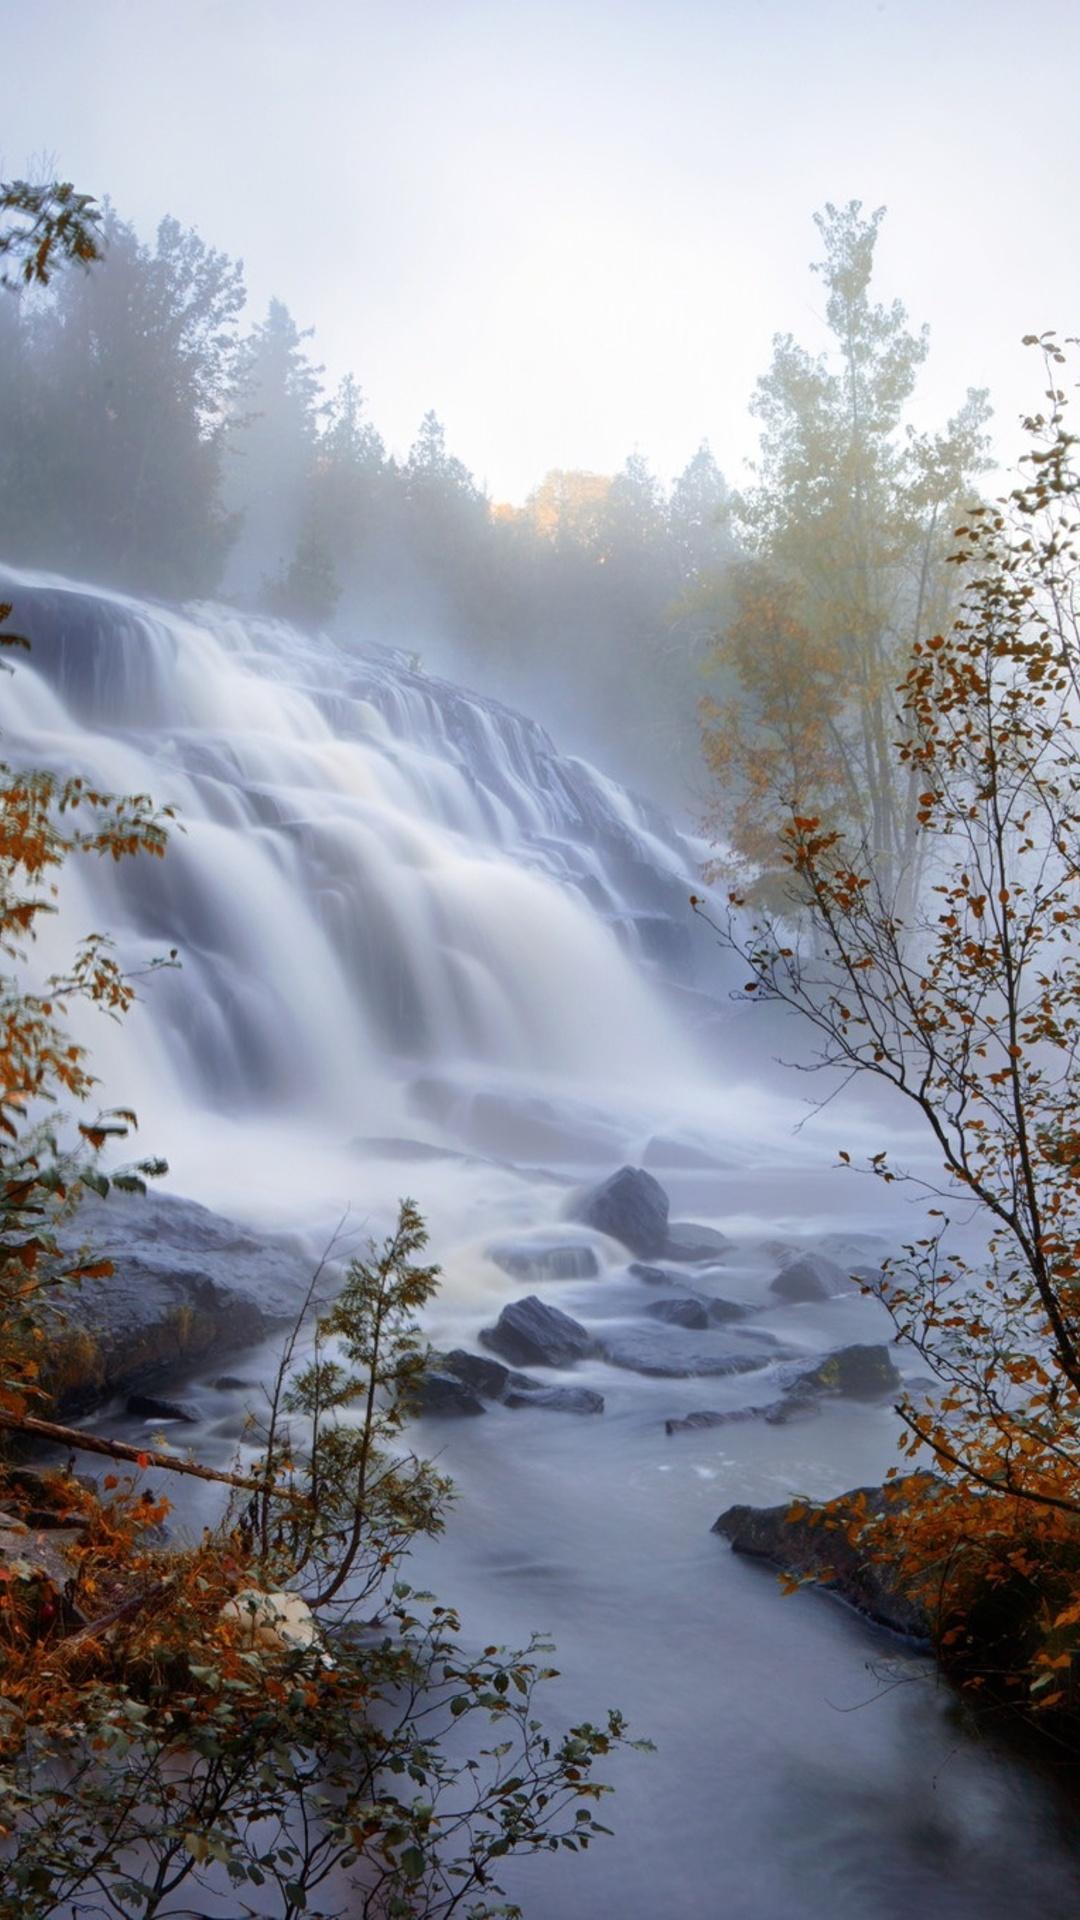 earth-waterfall-fog-4o.jpg